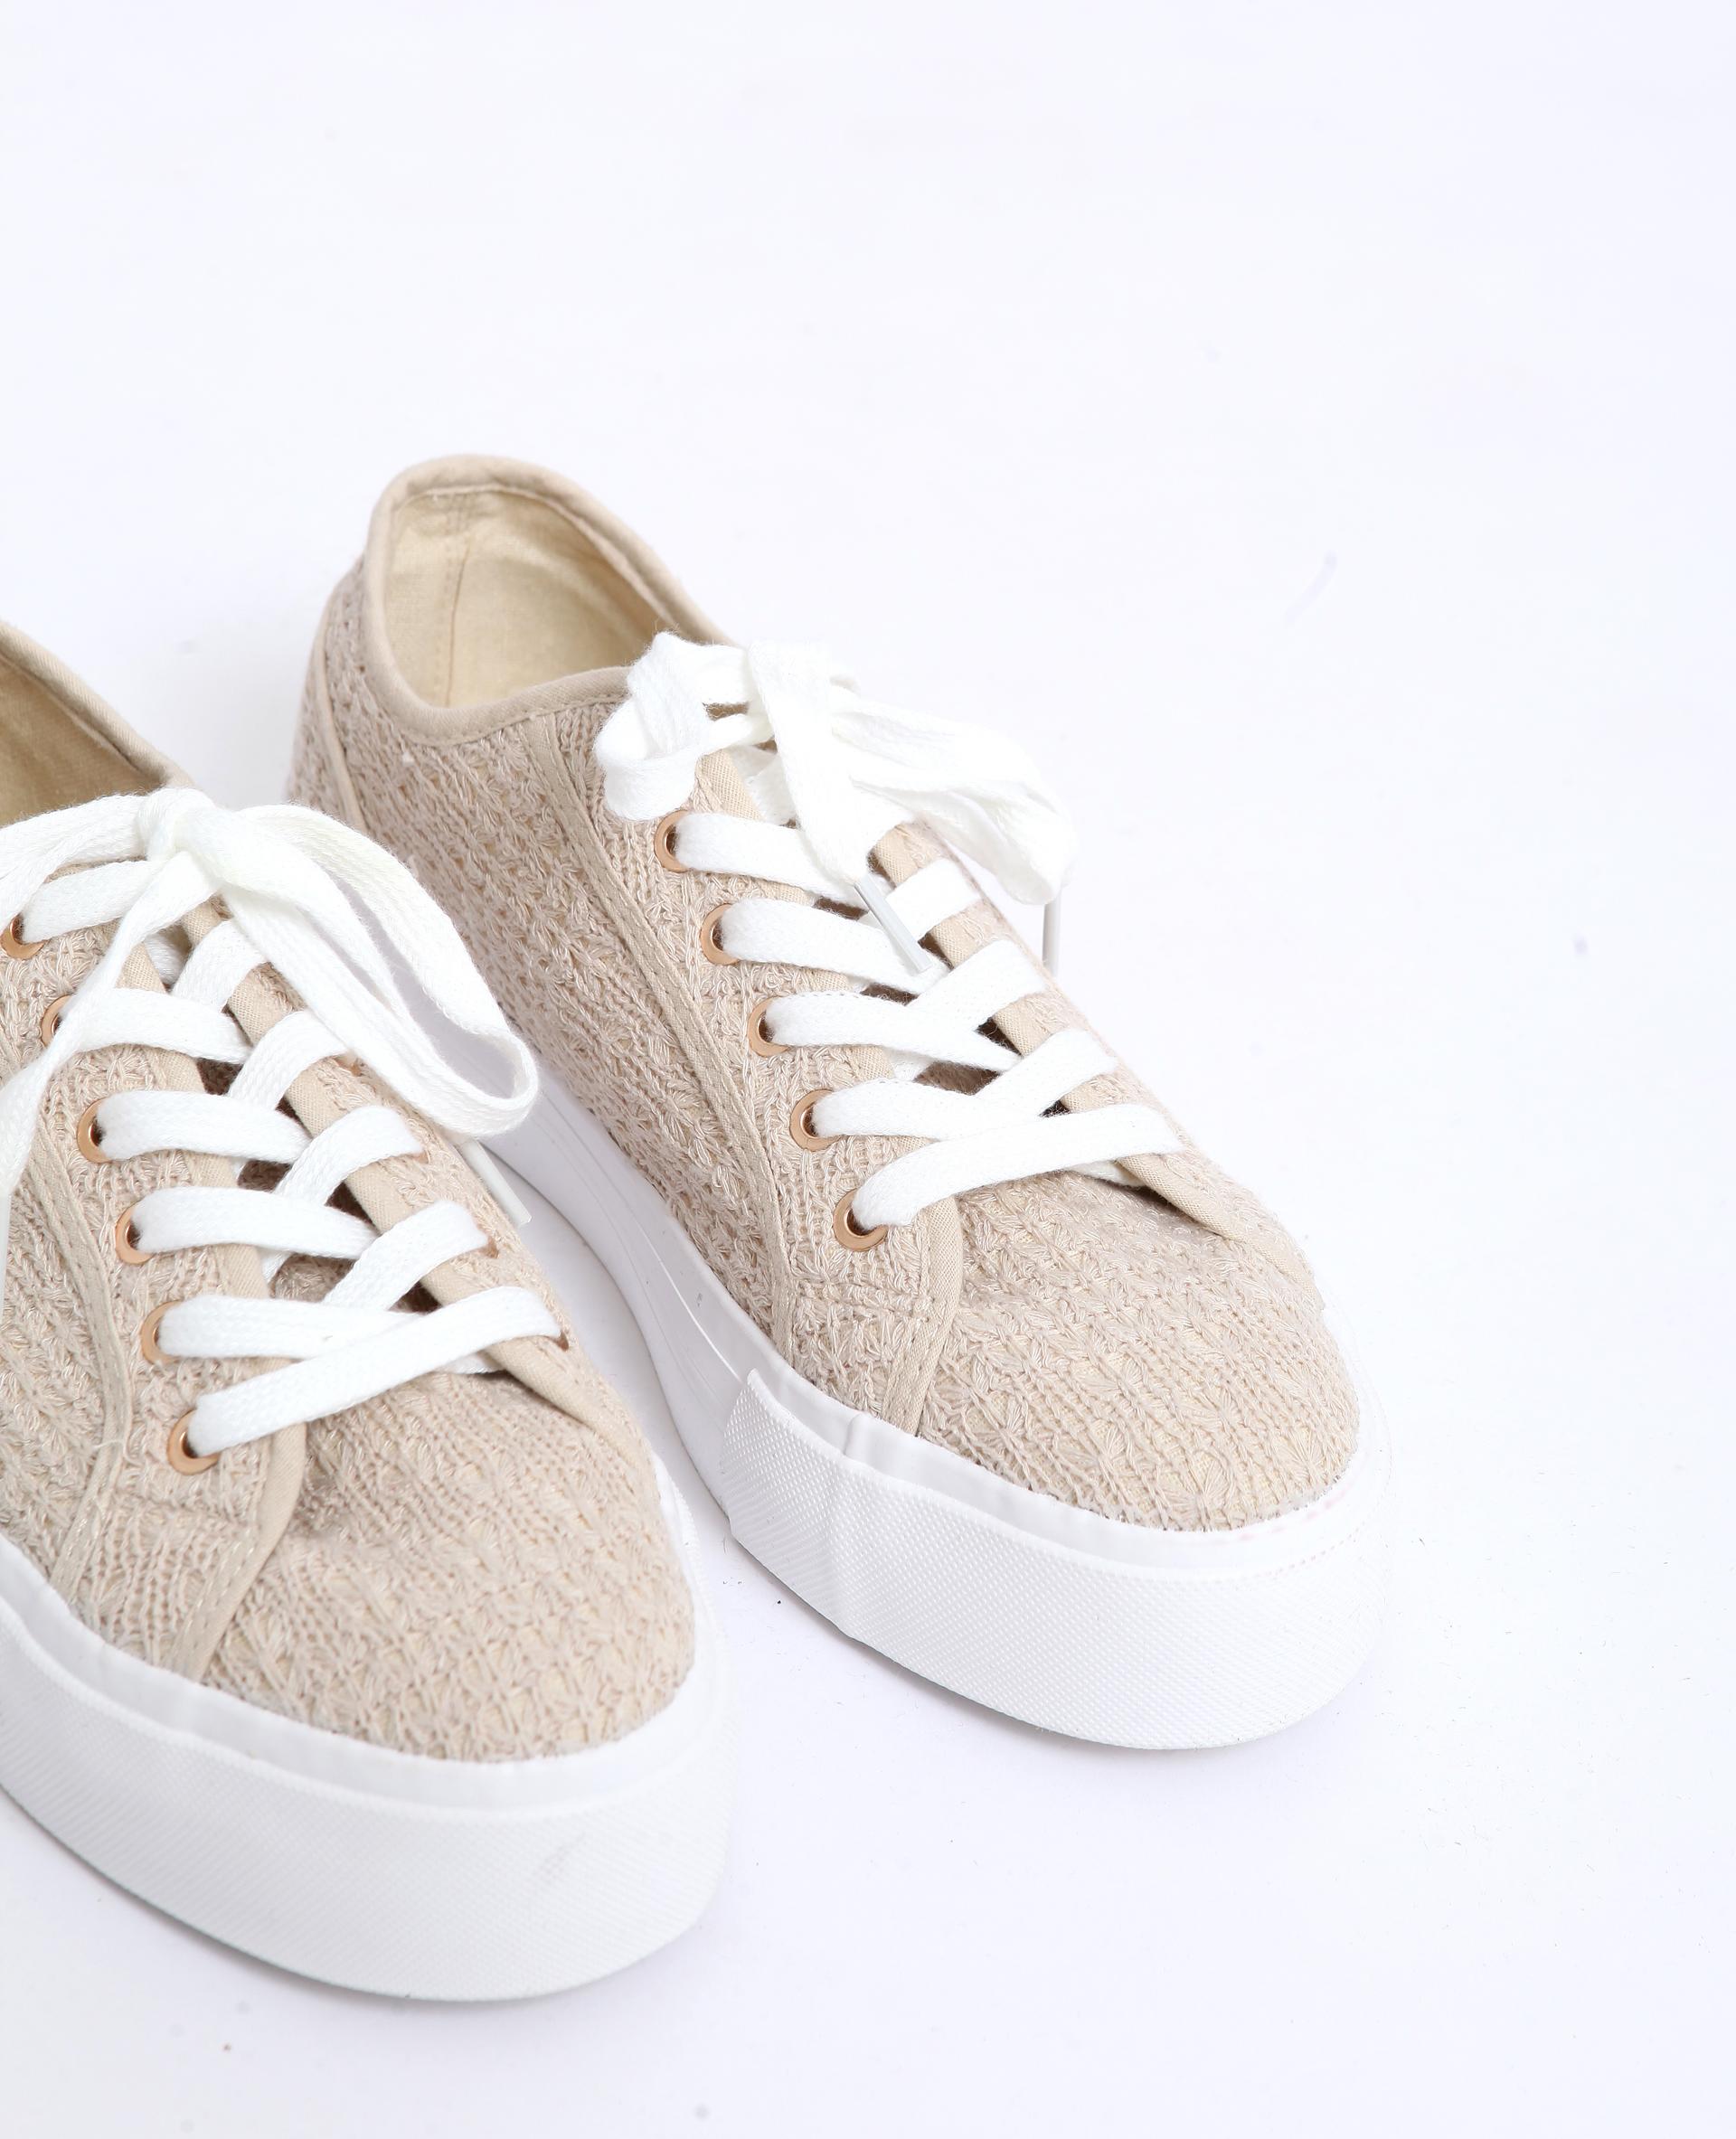 d5cd4dd24d2 Sneakers met dikke zool beige - 916928E03A07   Pimkie